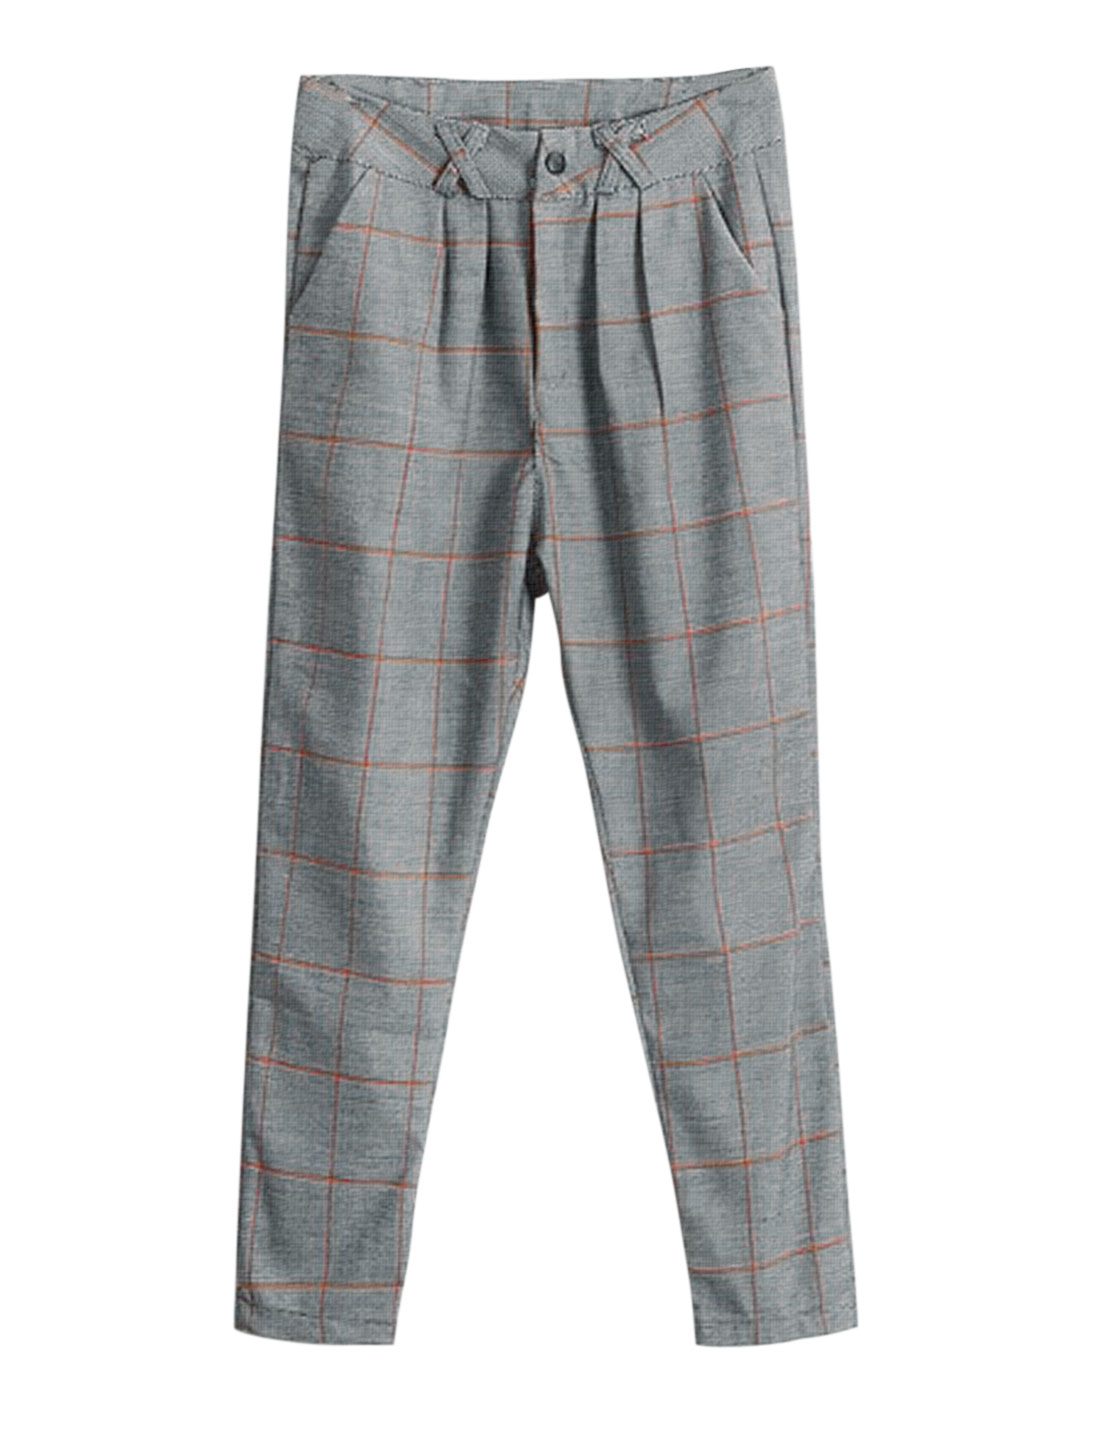 Slim Fit Casual Plaids Pattern Zip Fly Capris Pants w Belt for Lady Gray M